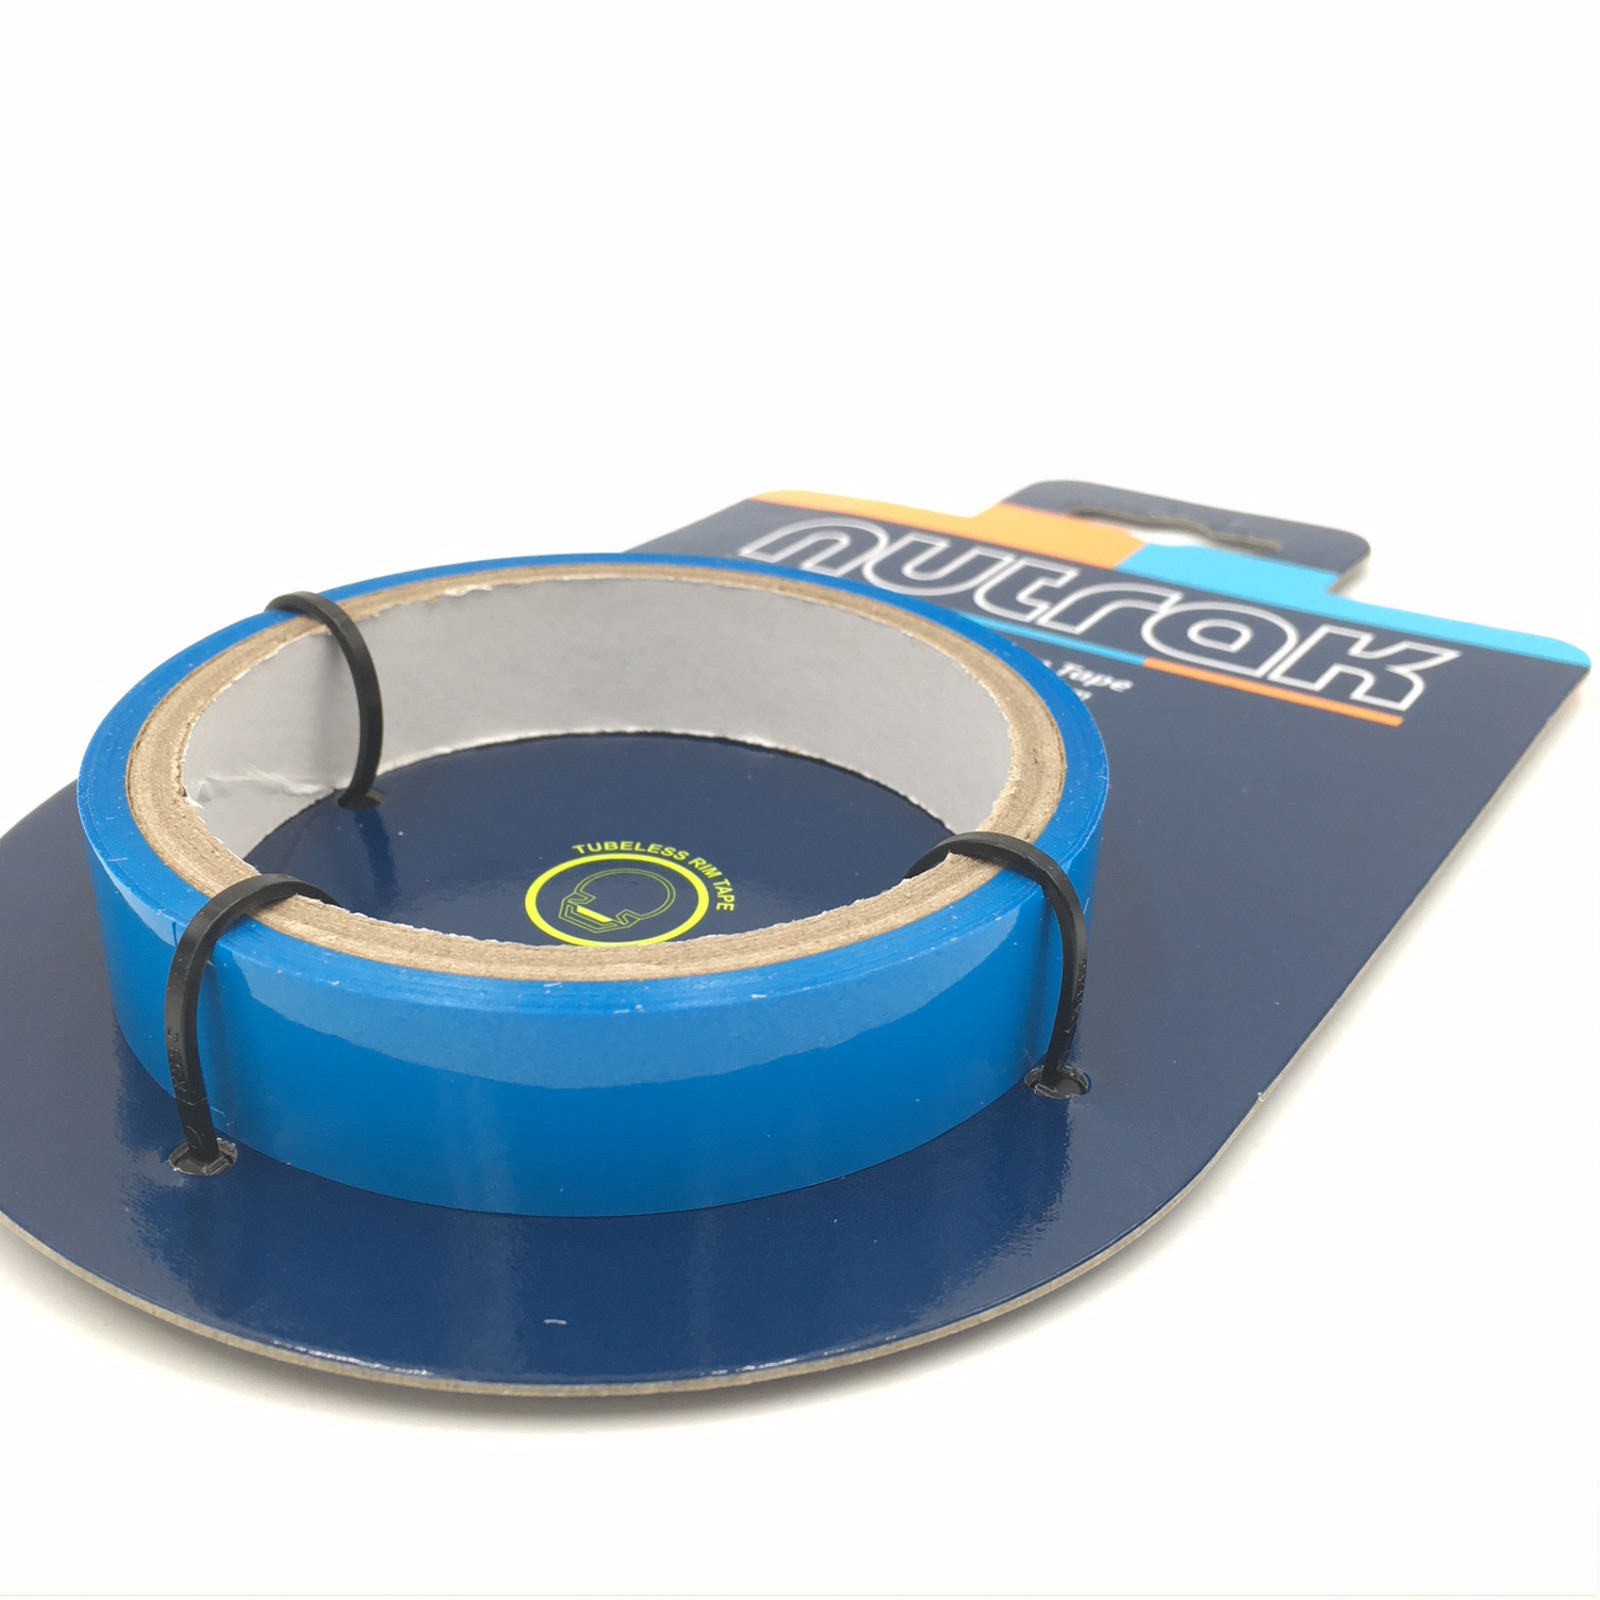 Nutrak-Tubeless-Ready-Waterproof-Rim-Tape-Blue-10m-Roll thumbnail 8